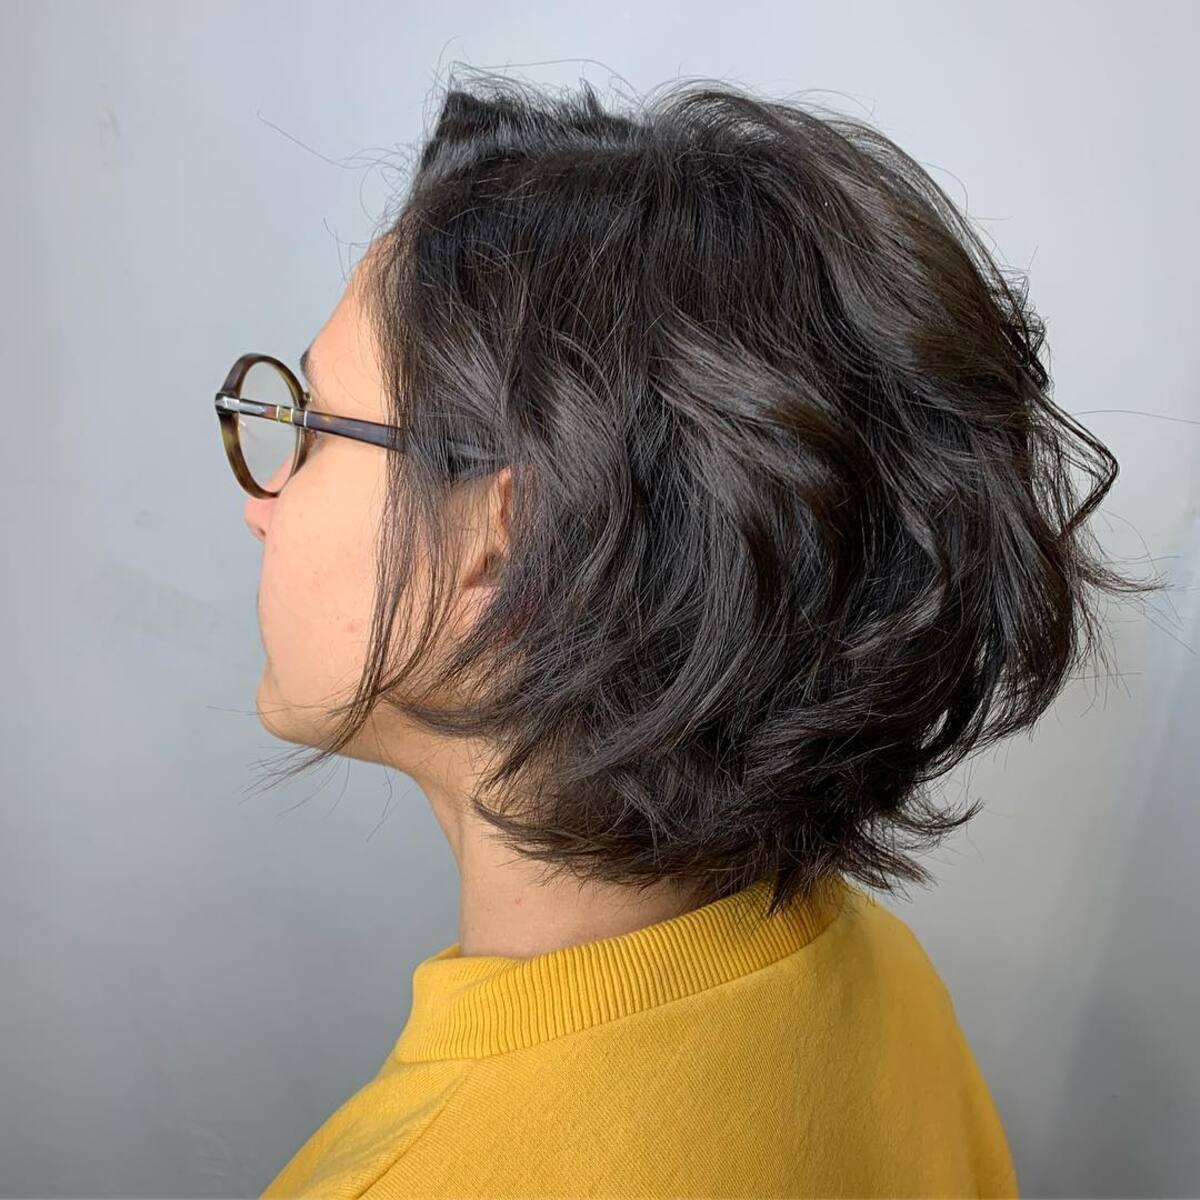 cuadrado graduado ondulado corto para mujer